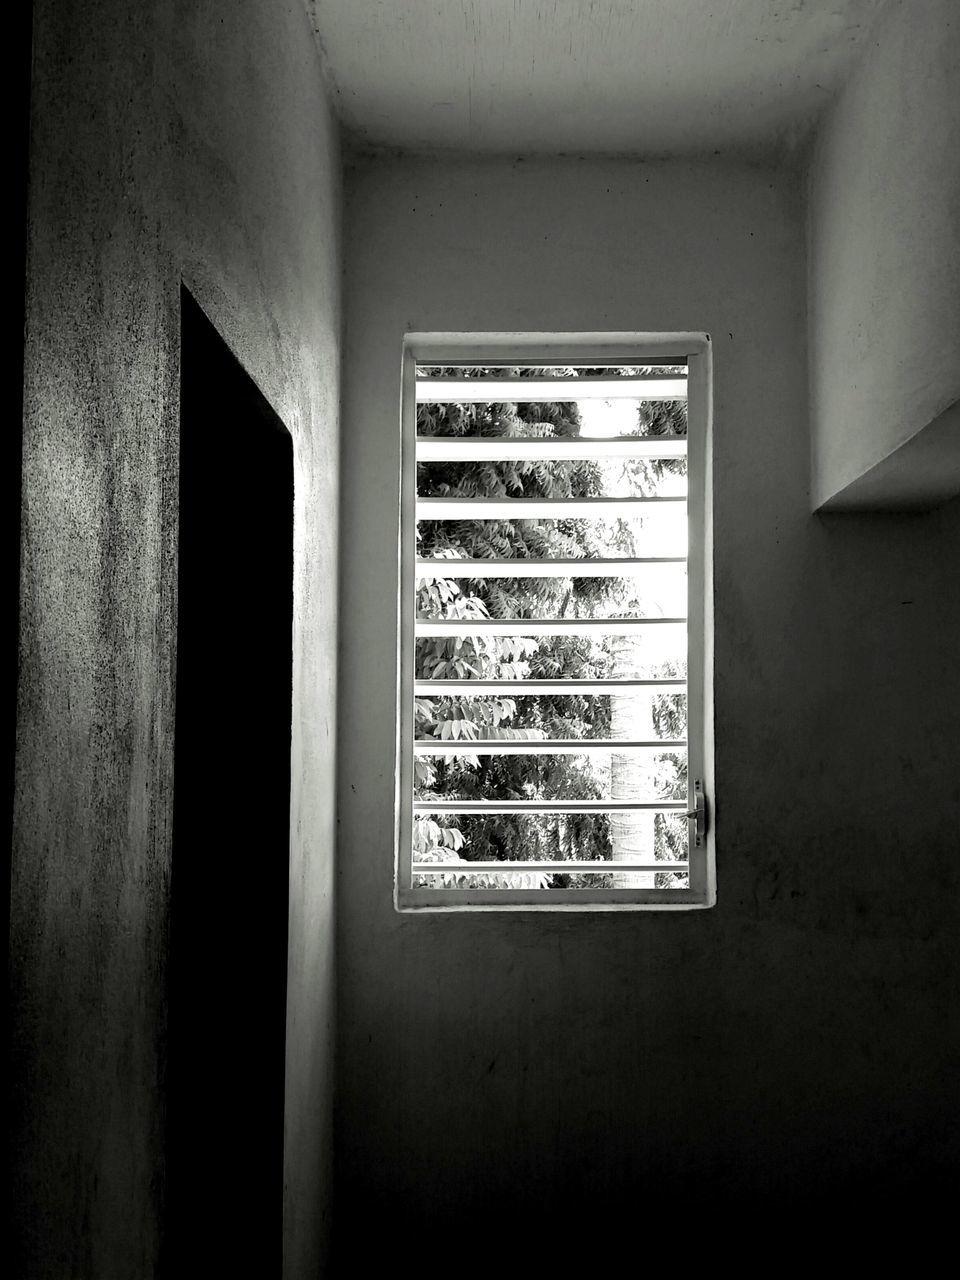 window, indoors, no people, architecture, day, illuminated, close-up